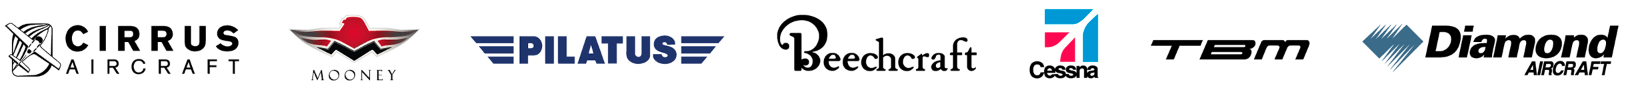 logos-buyer-broker-page